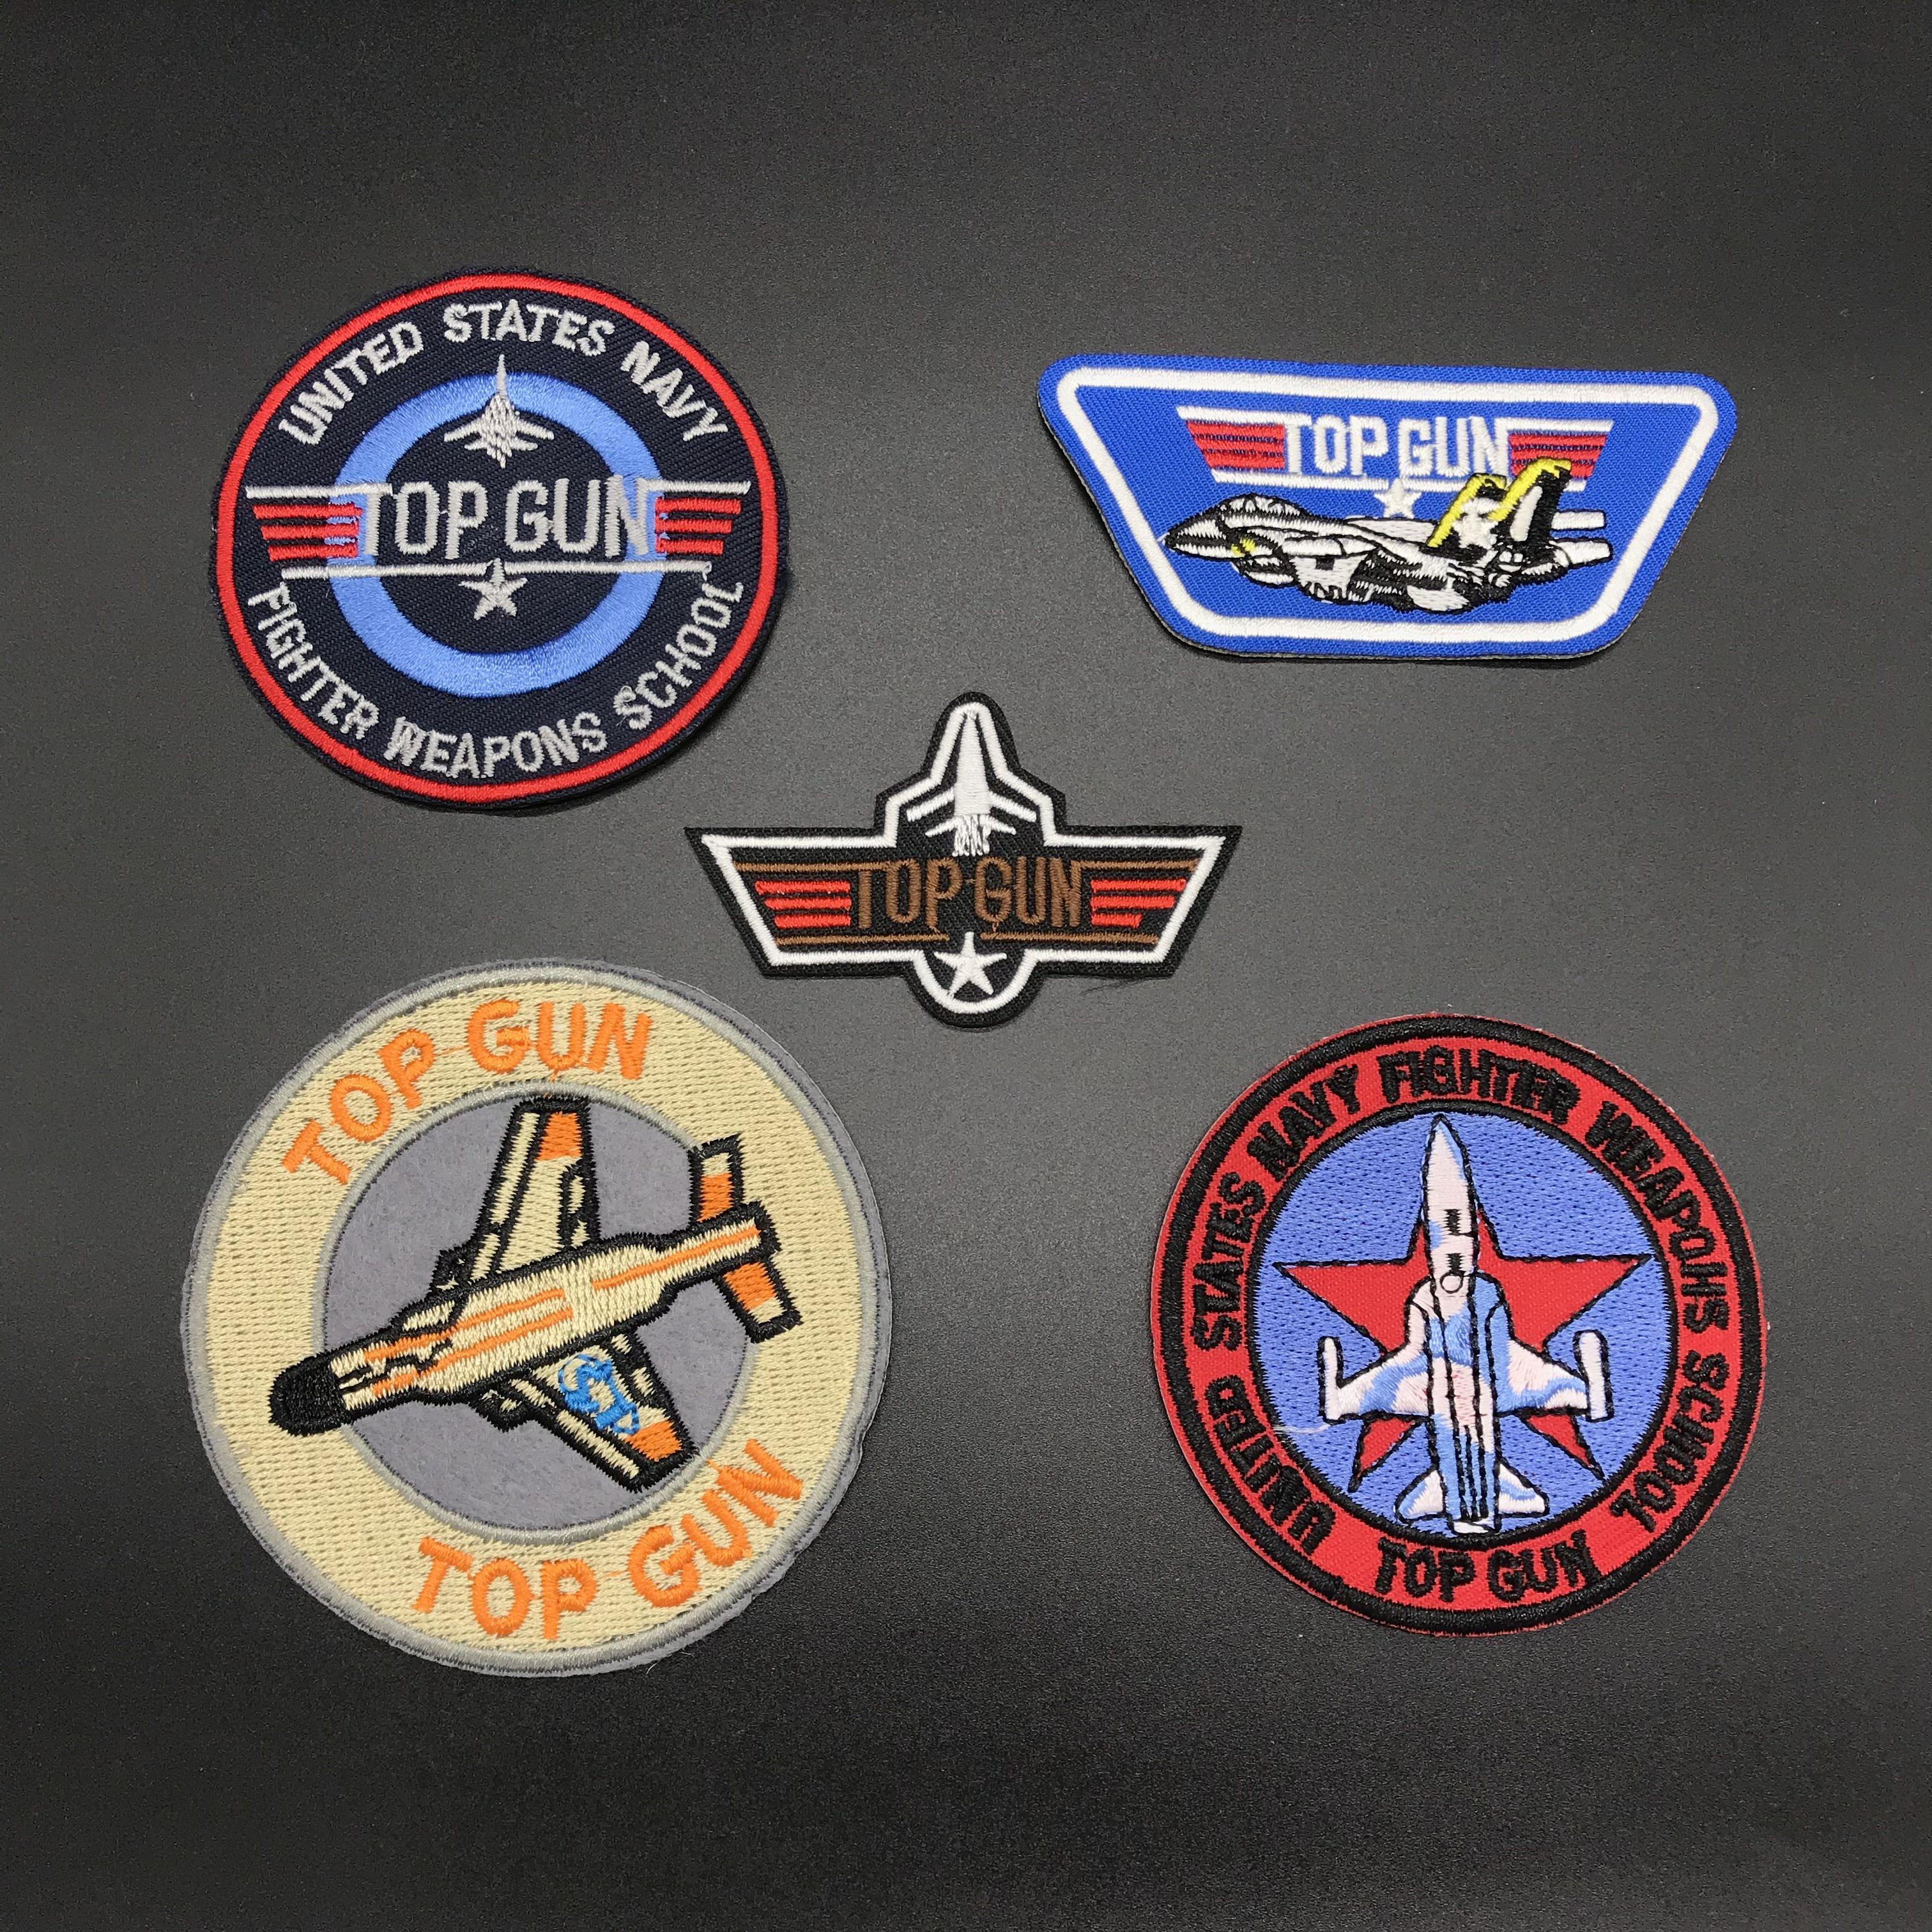 Tomcat patch F-14 Top Gun movie USN Navy US morale Pilot Costume Cruise top gun